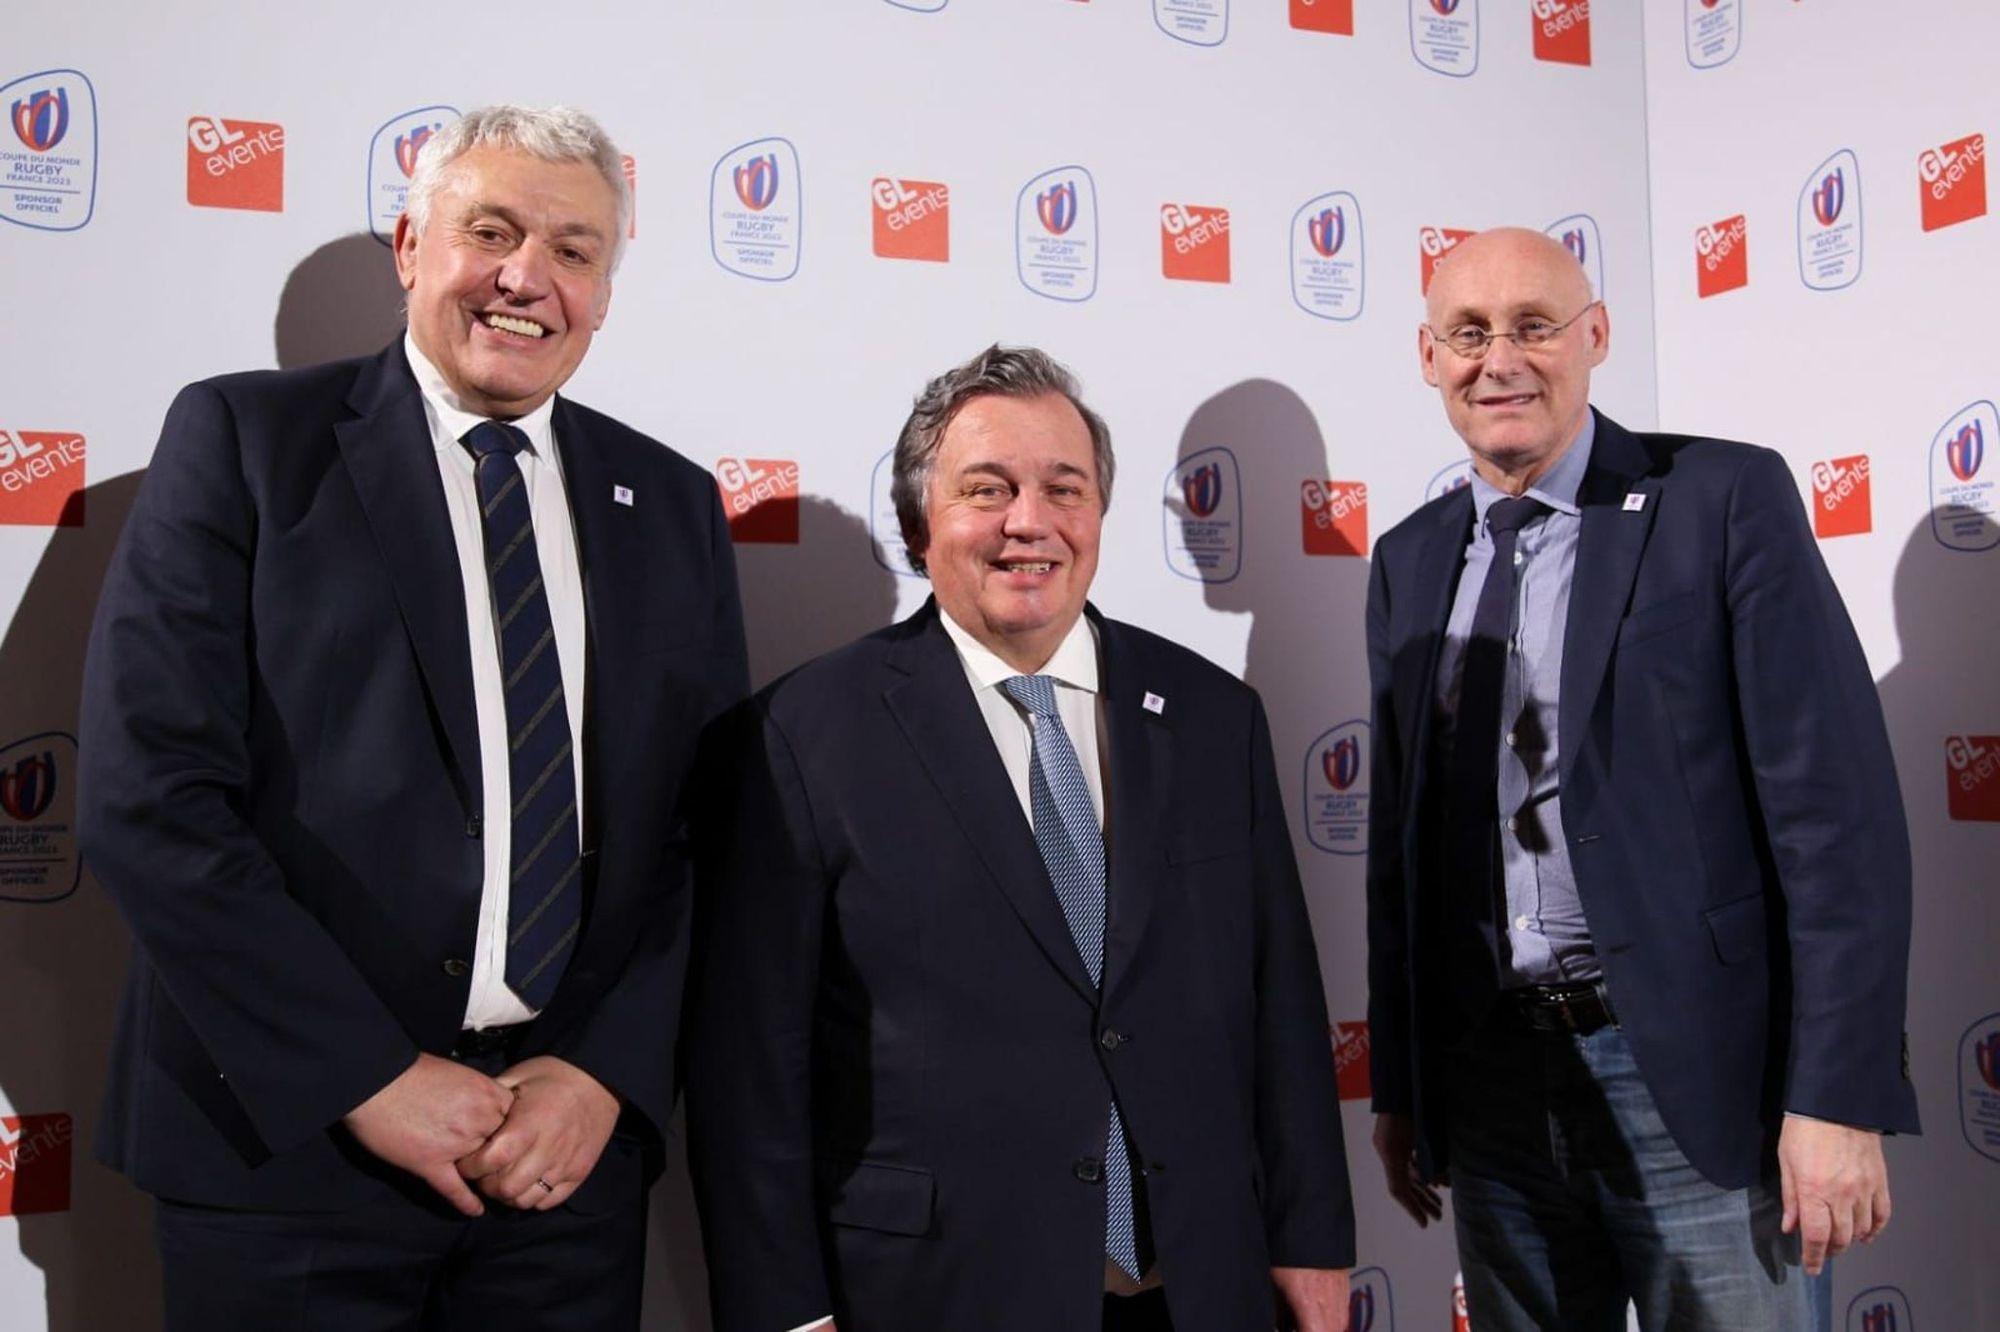 Claude Atcher, Bernard Laport, Olivier Ginon, GL Events, RWC